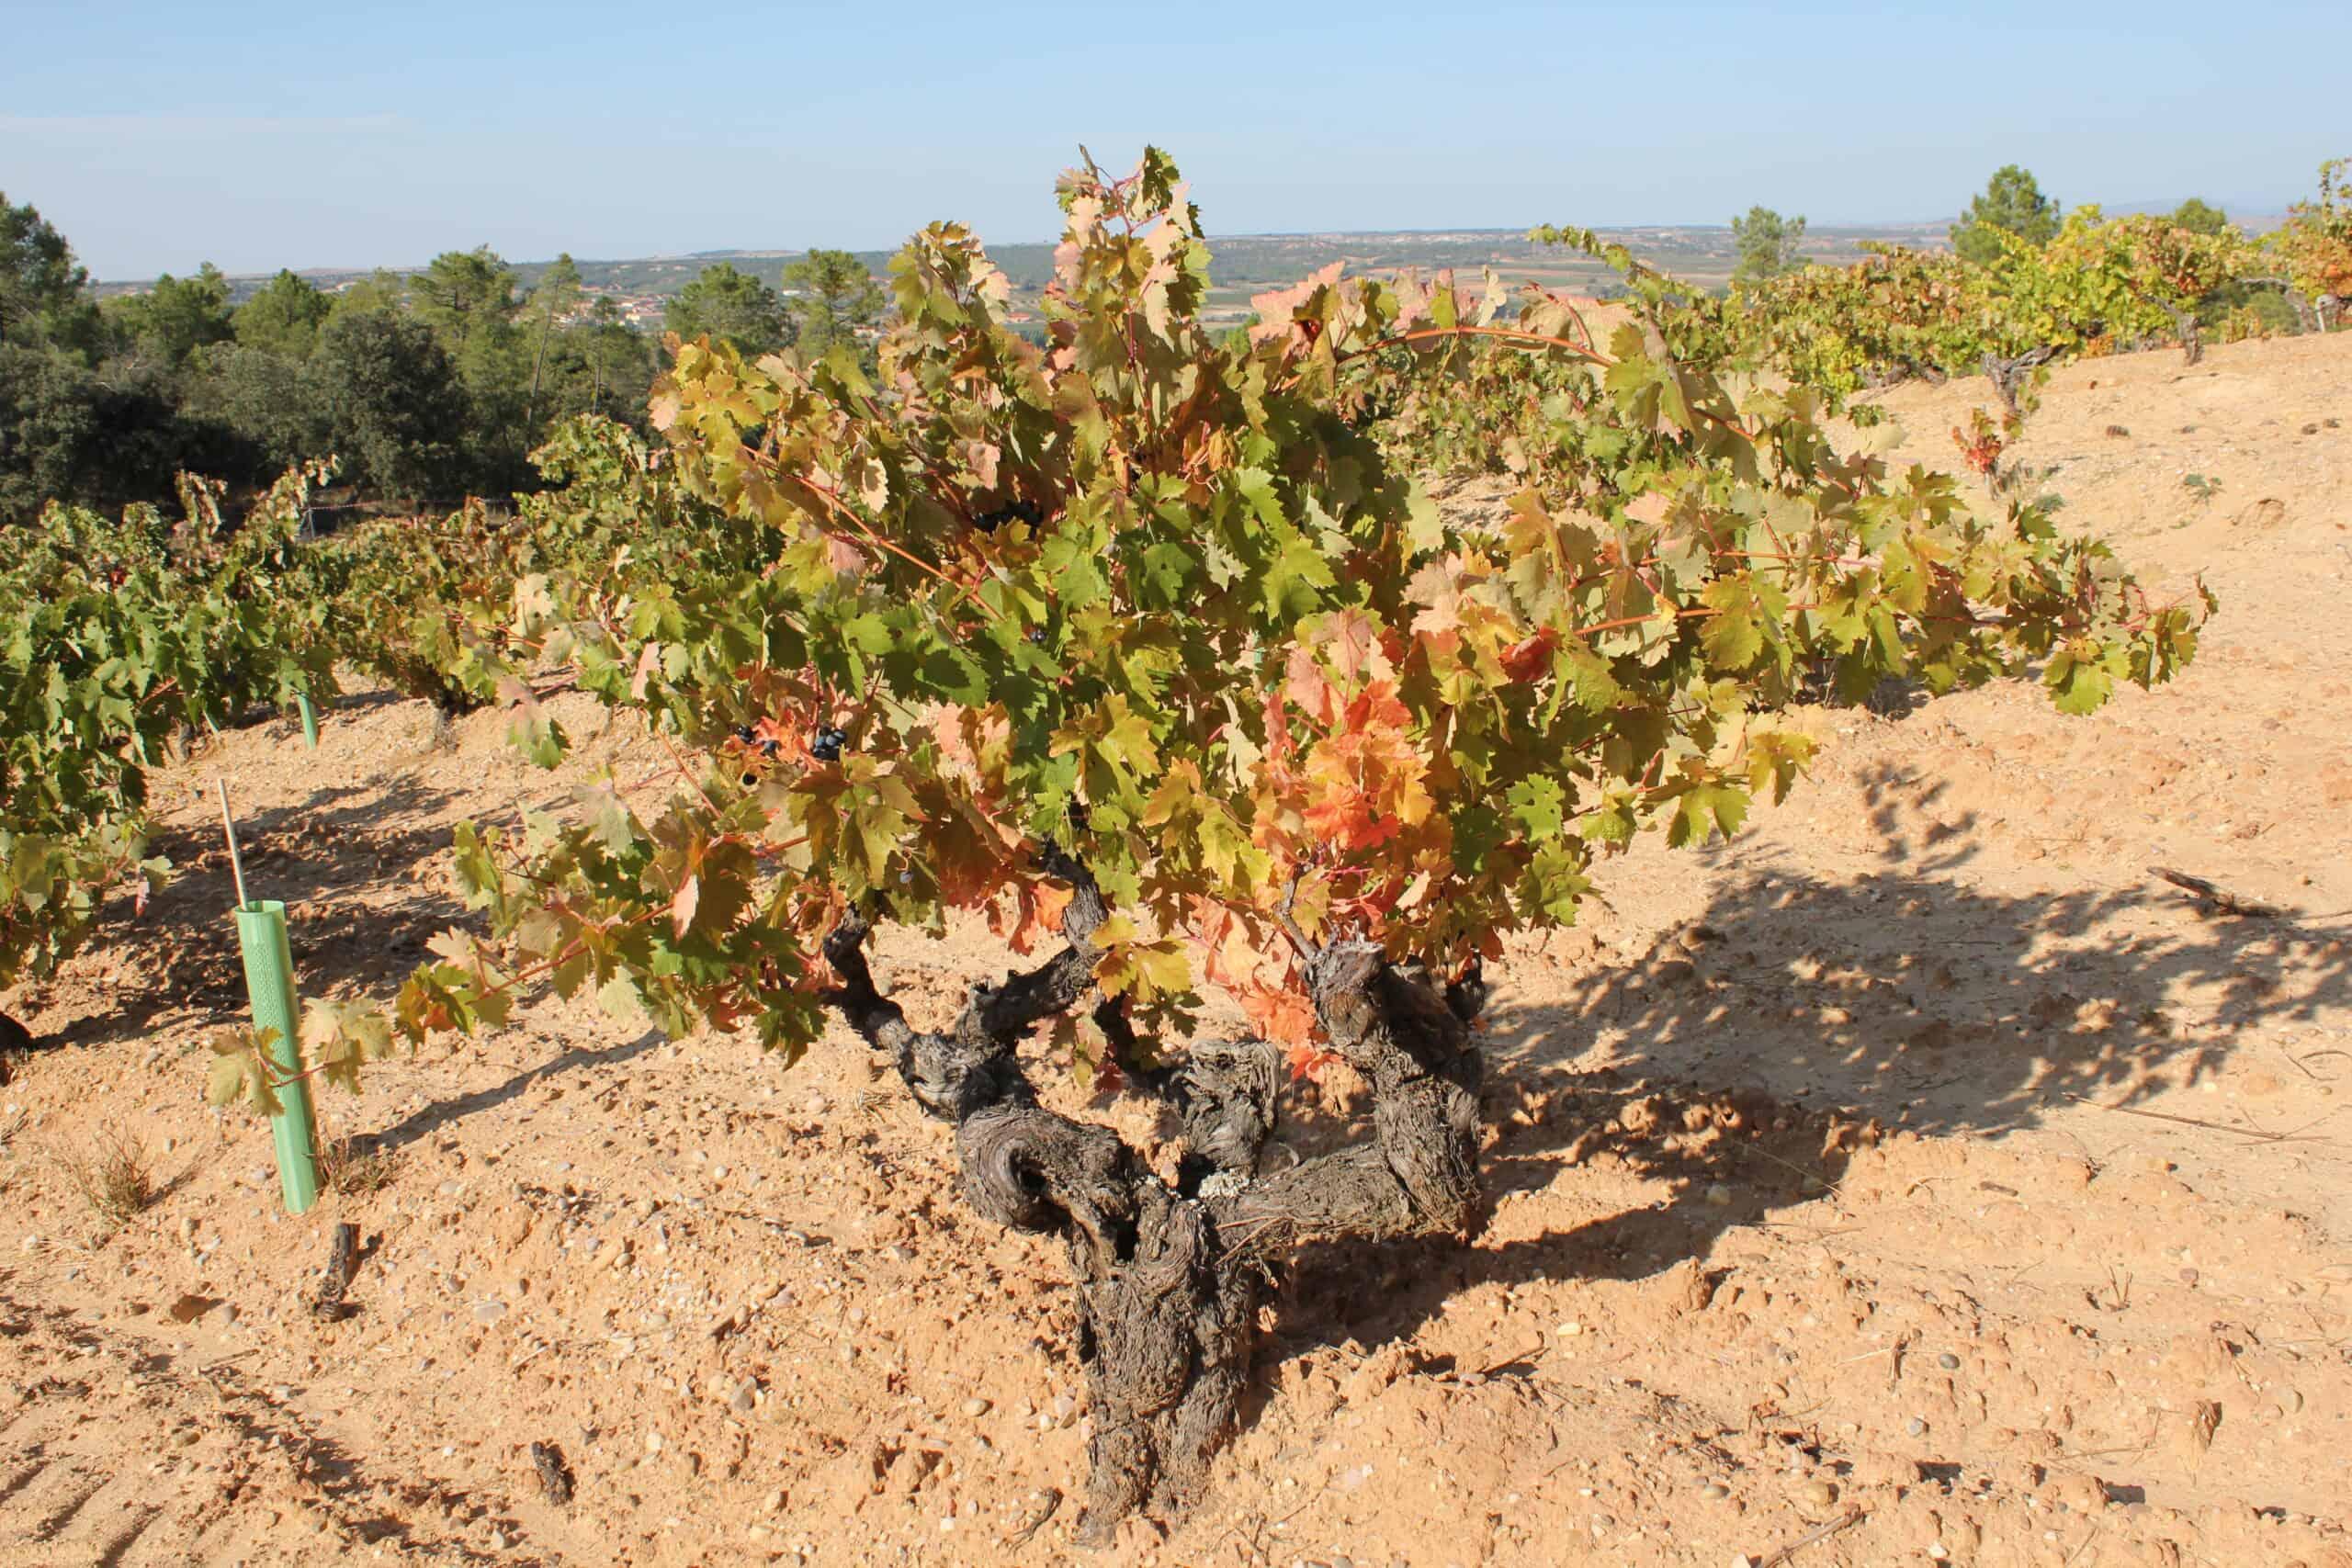 Gamla vinrankor – åldern har betydelse